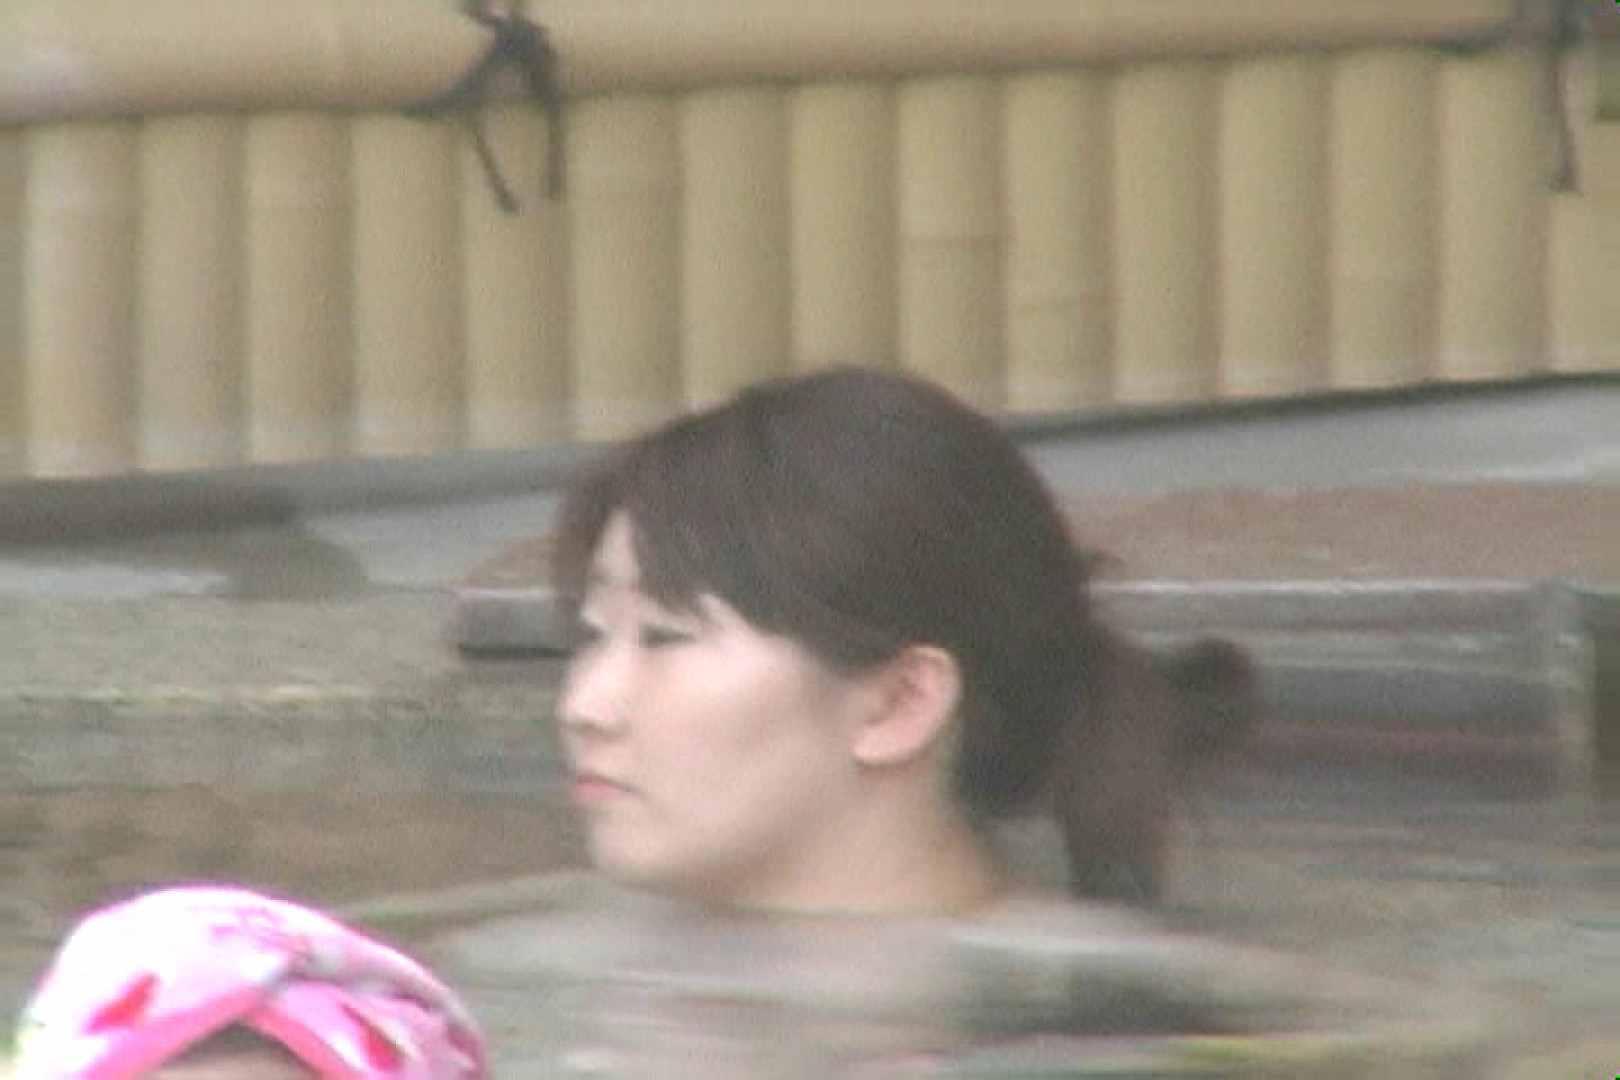 Aquaな露天風呂Vol.25 盗撮師作品  72pic 48